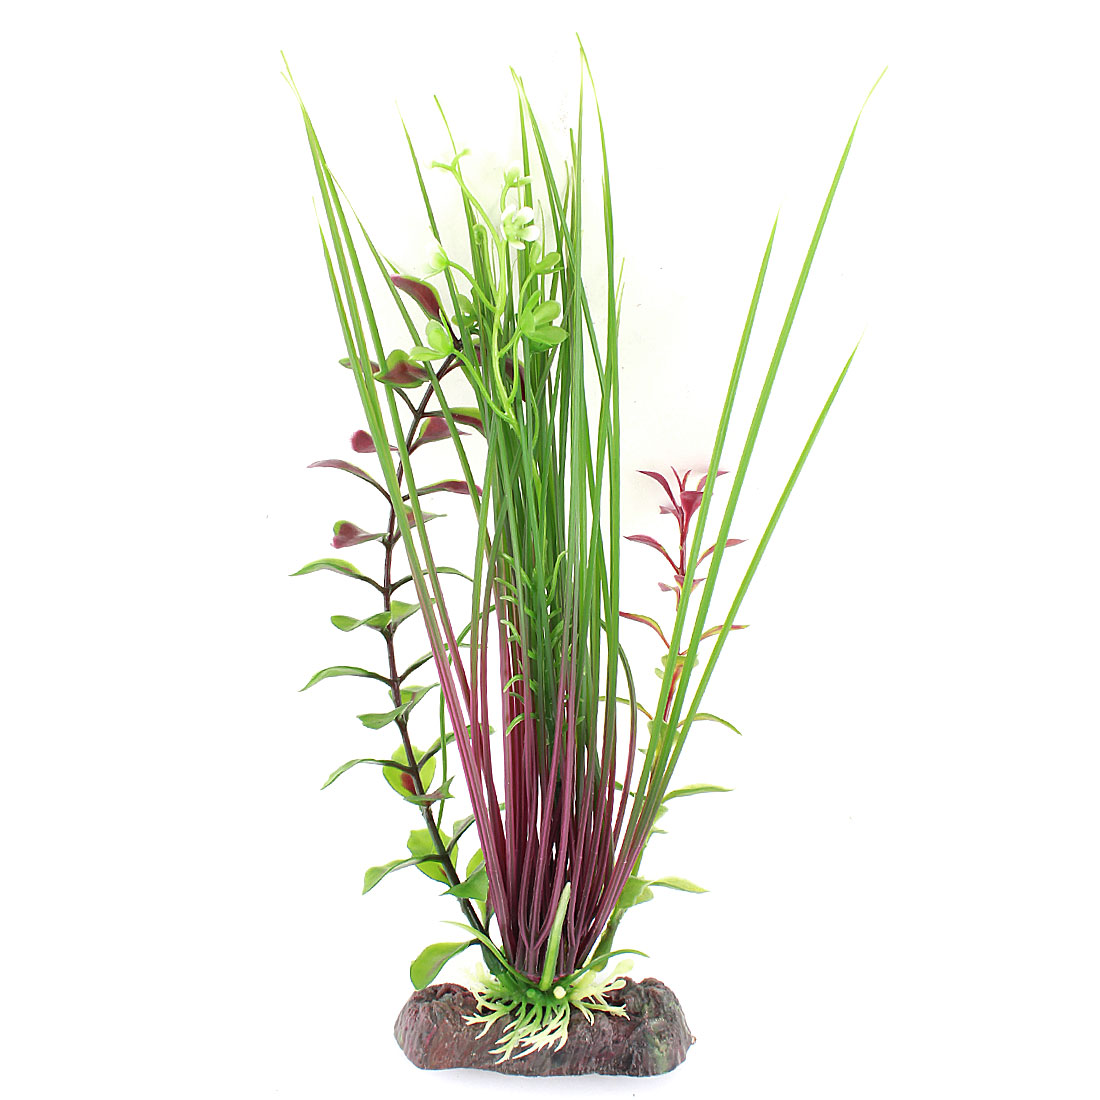 "Aquarium Fish Tank Ornament 9.8"" High Green Burgundy Plastic Artificial Underwater Grass Flower Plant"